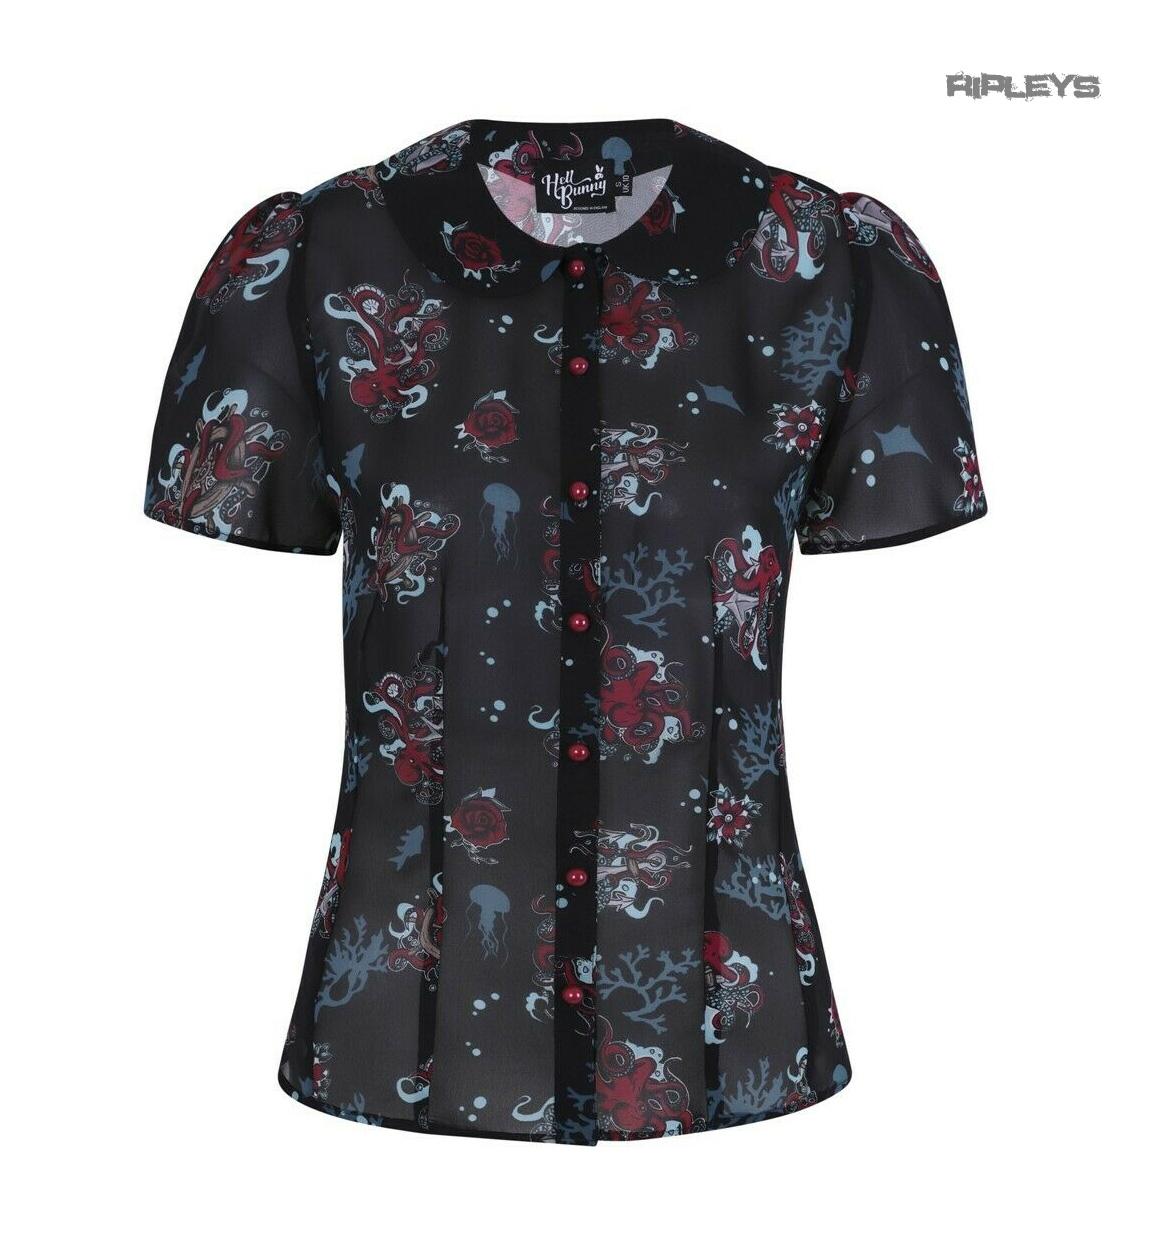 Hell-Bunny-50s-Shirt-Top-Black-Ocean-Octopus-Roses-POSEIDON-Blouse-All-Sizes thumbnail 16